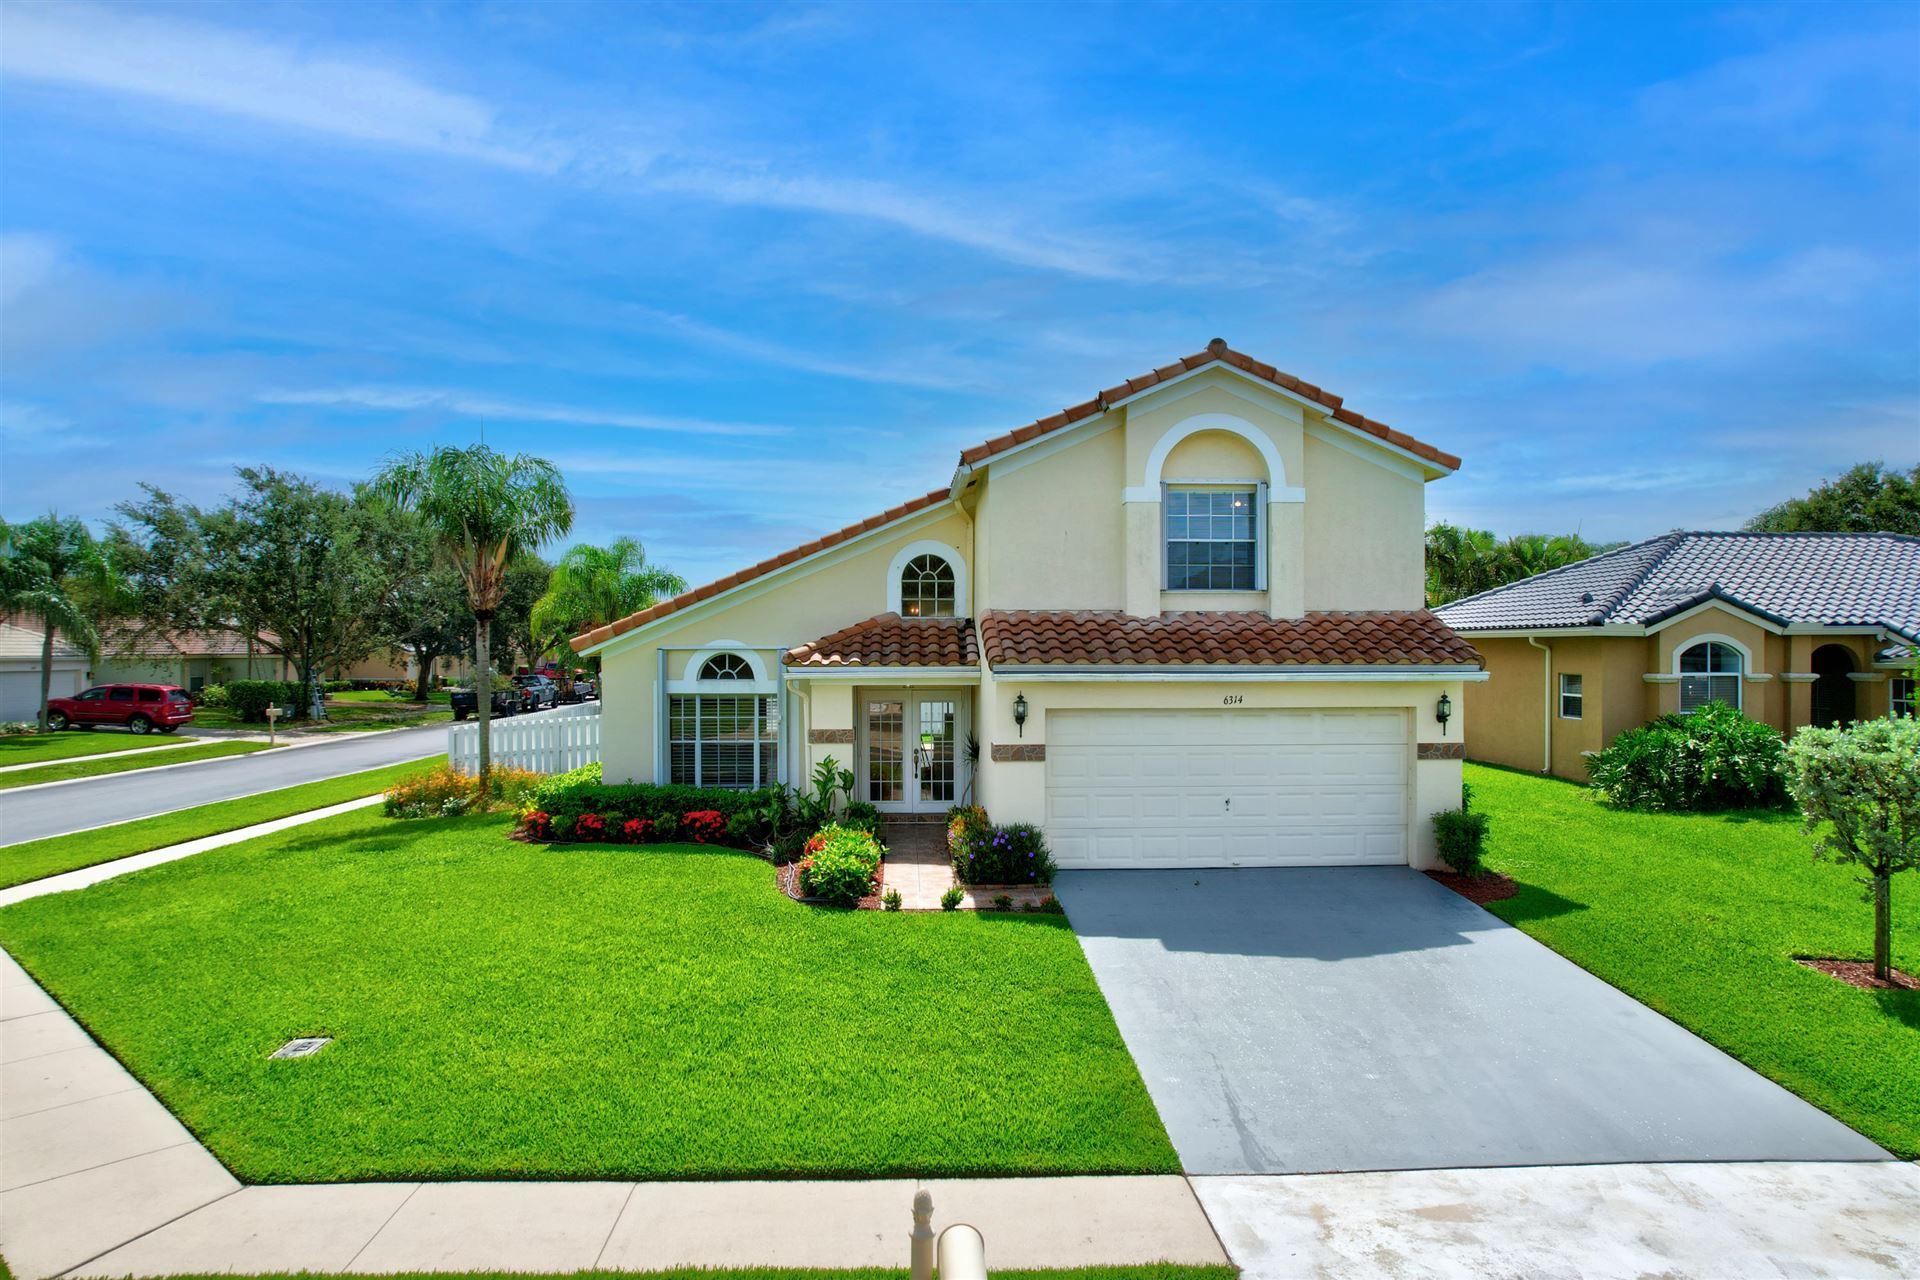 6314 Dornich Lane, Lake Worth, FL 33463 - MLS#: RX-10721673